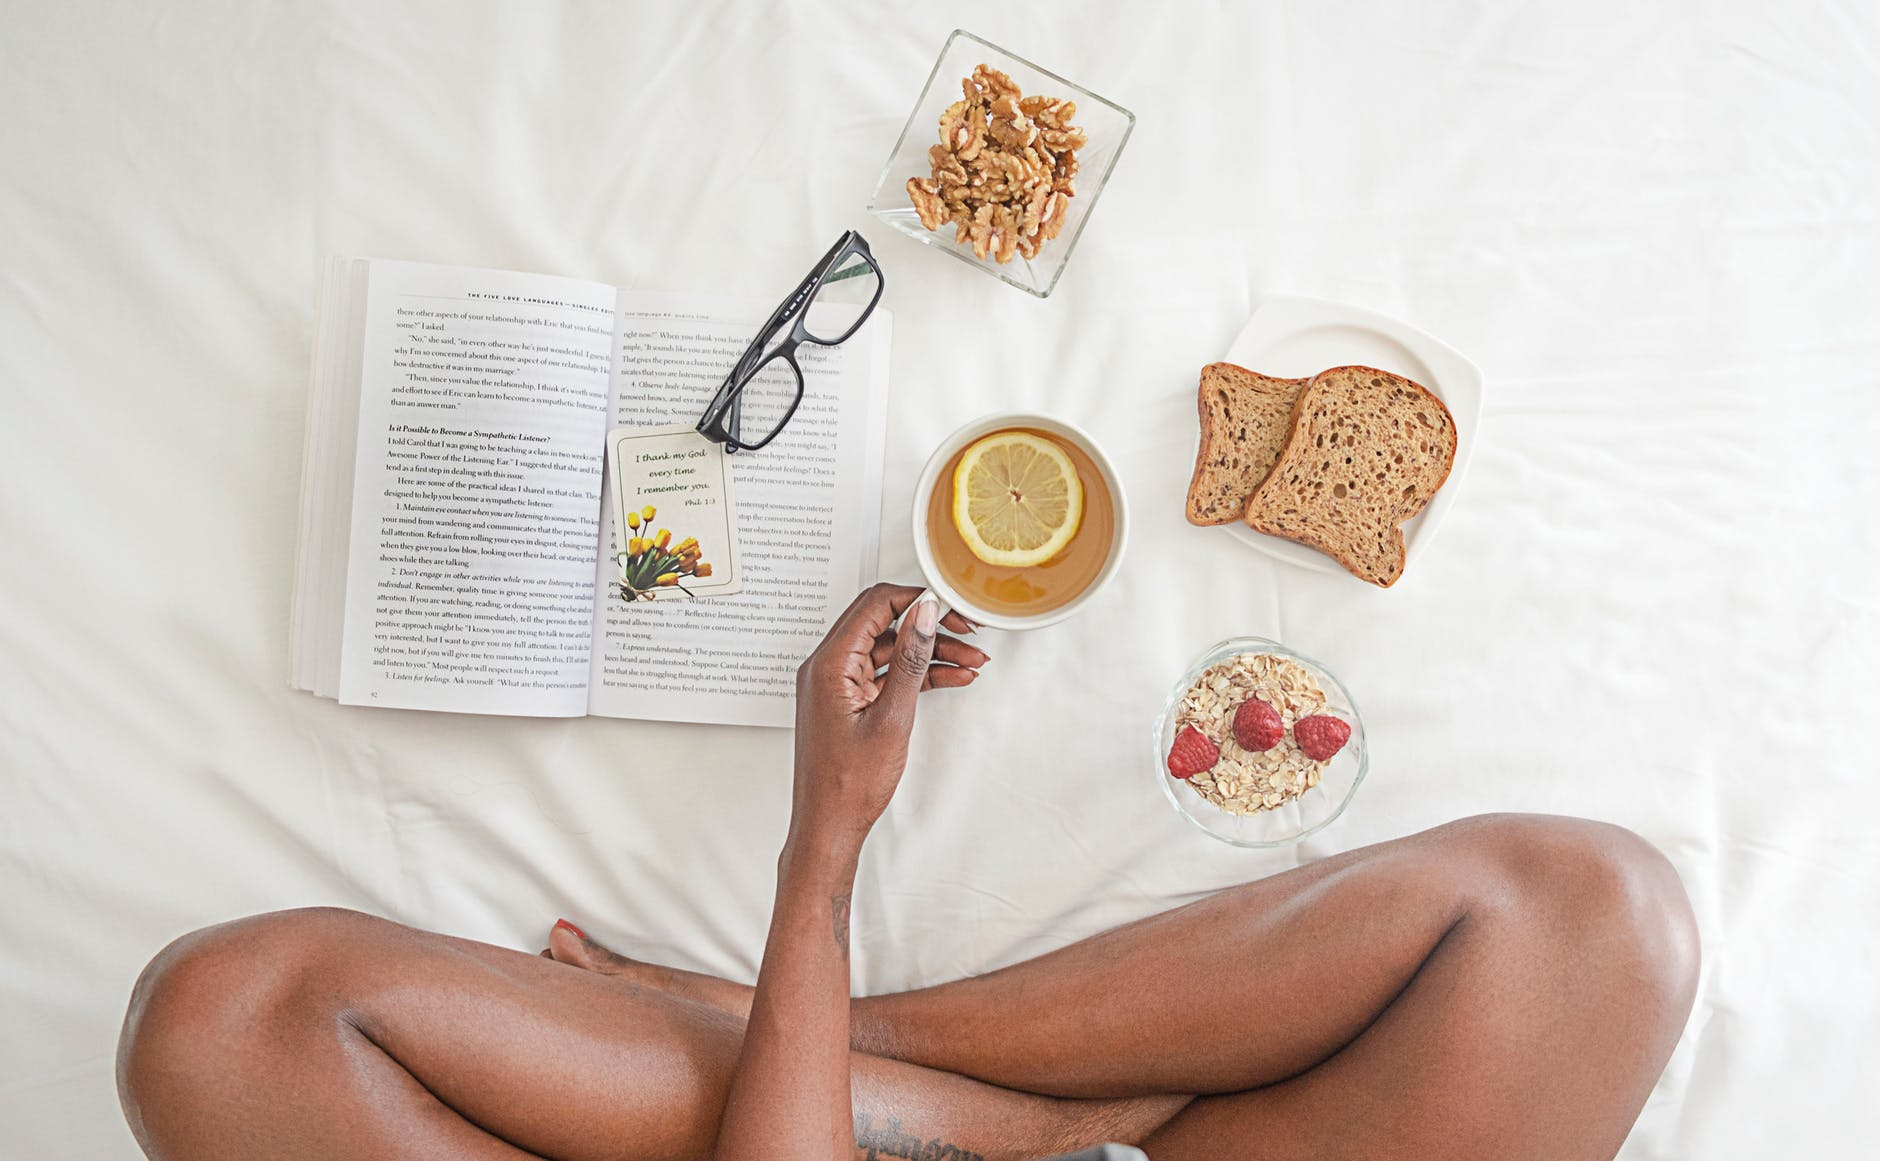 krevet hrana caj kruh zitarice knjiga naocale limun